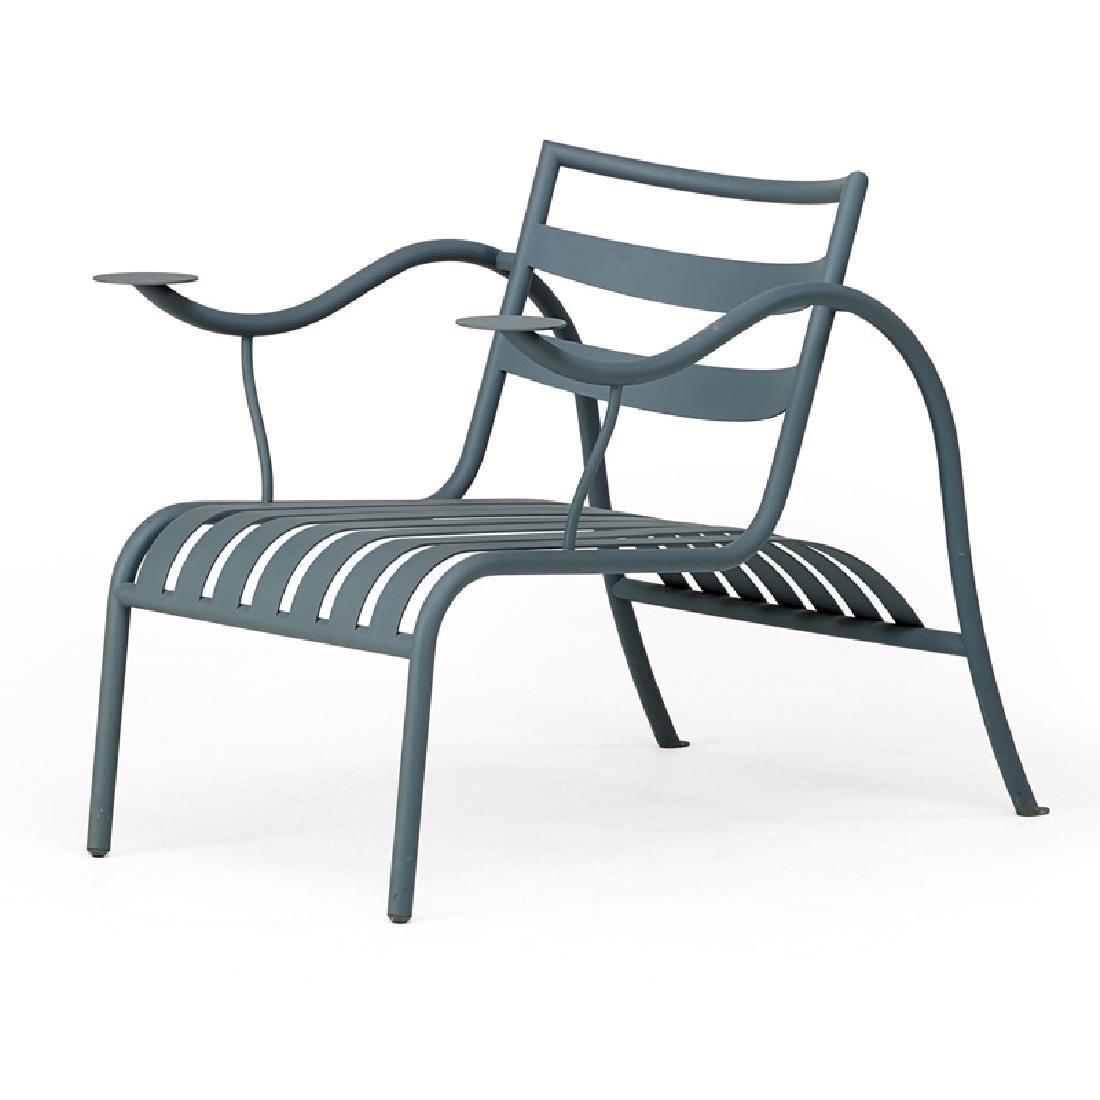 JASPER MORRISON Thinking Man's Chair